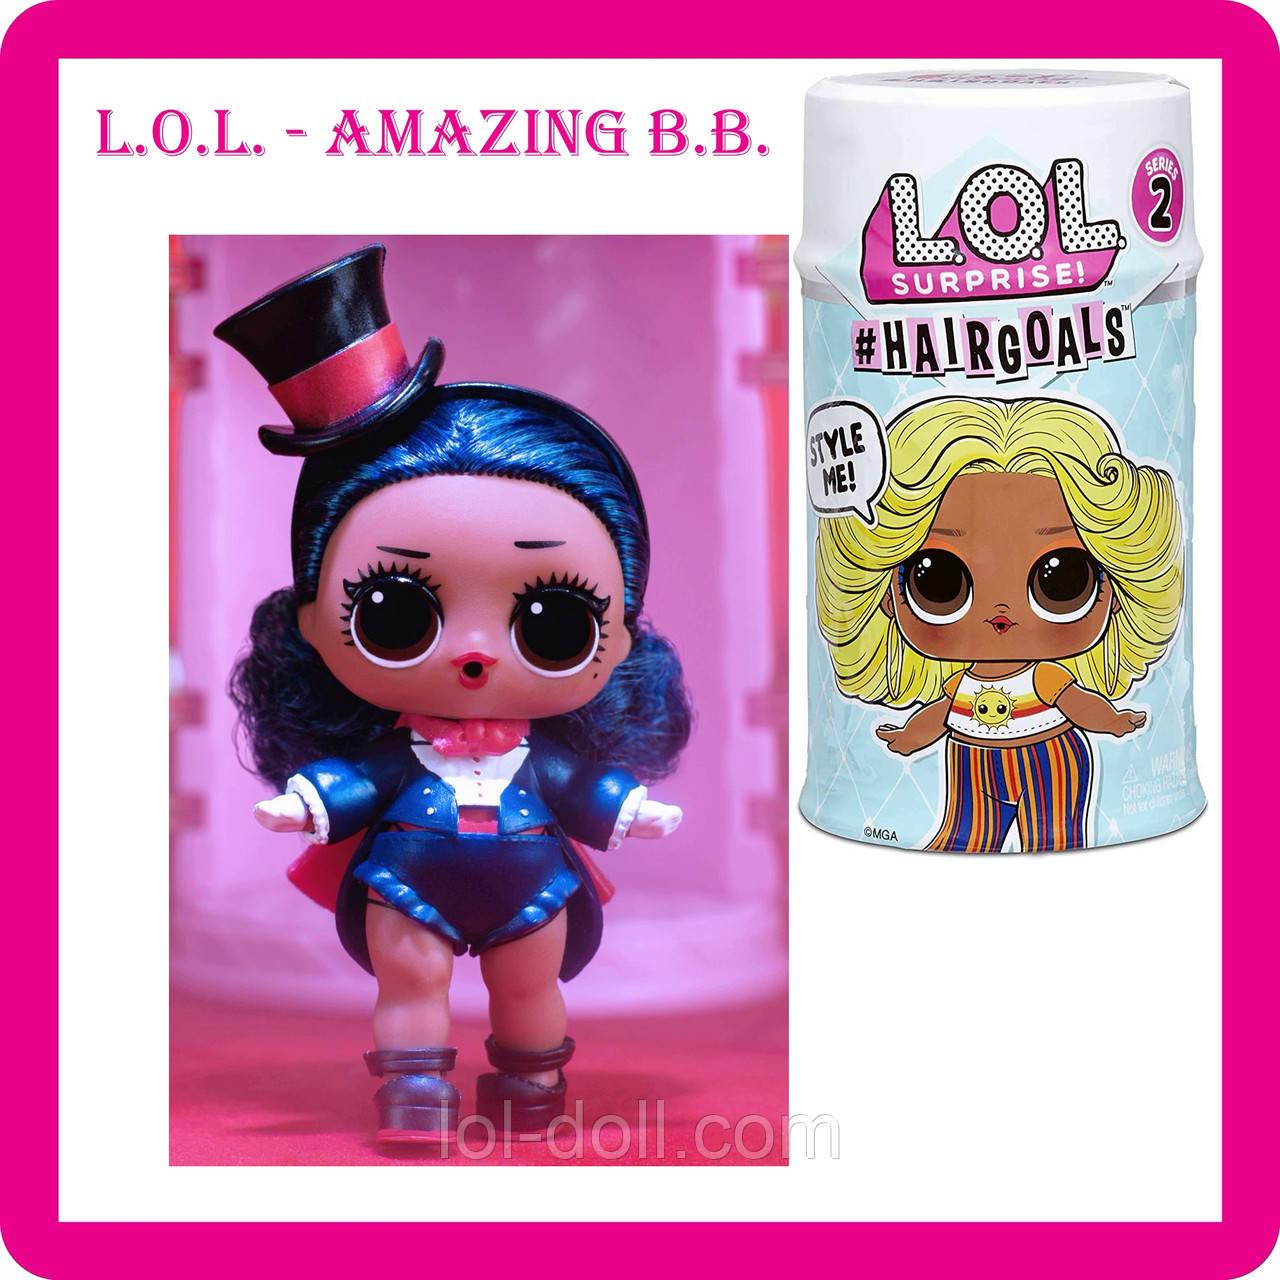 Кукла ЛОЛ Amazing B.B. LOL Surprise Оригинал Hairgoals 2 серия Хеиргоалс